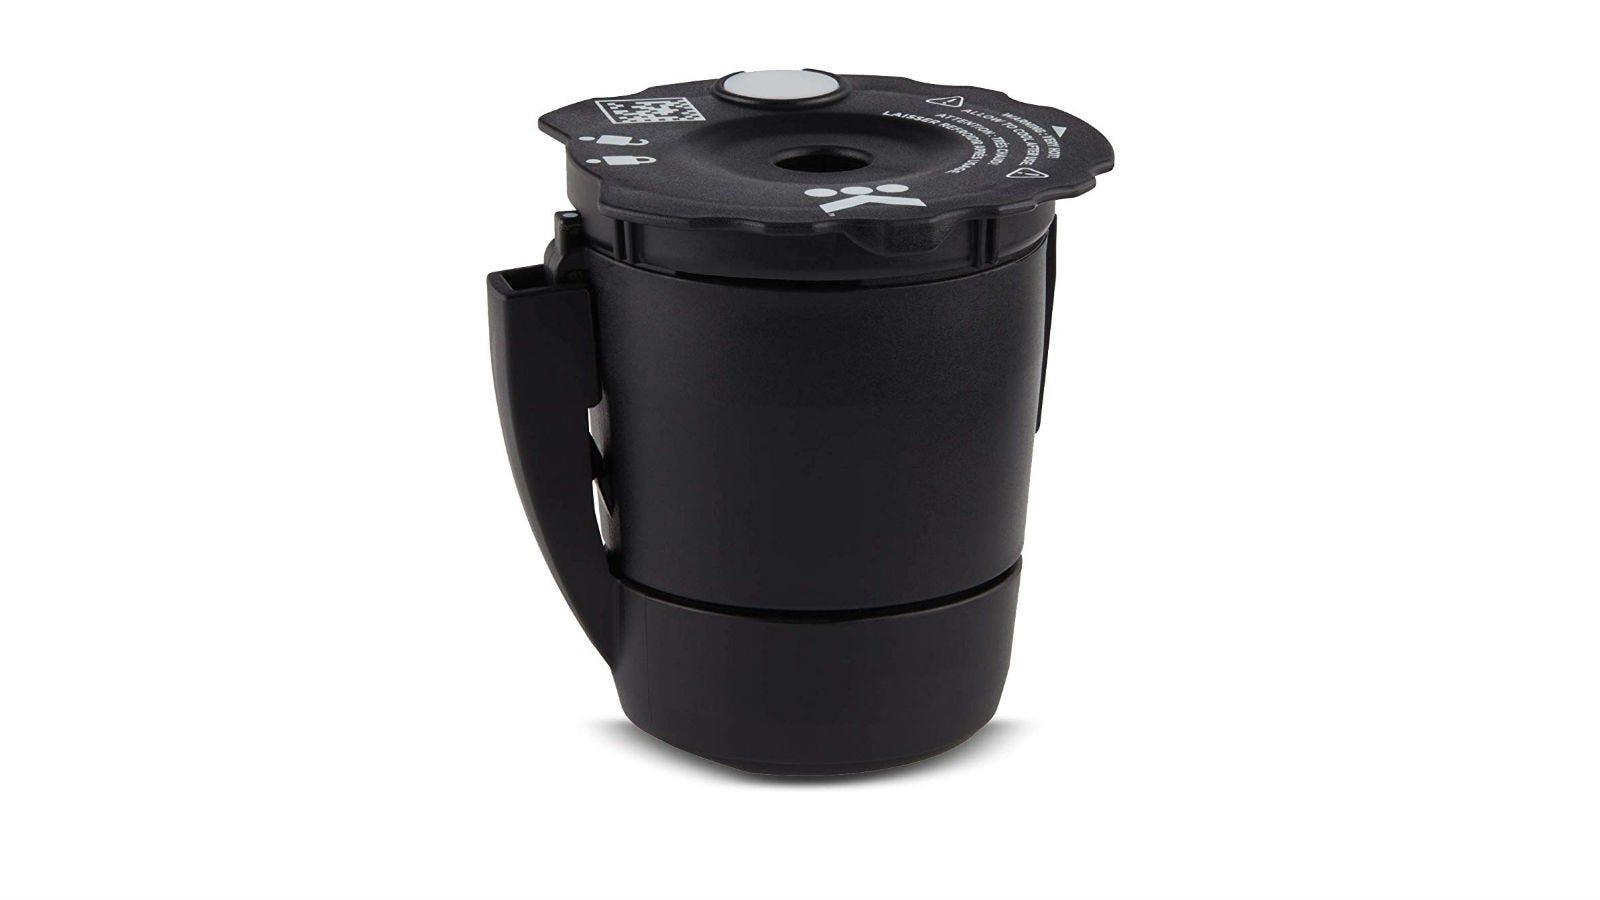 The Keurig My K-Cup Reusable Coffee Pod.